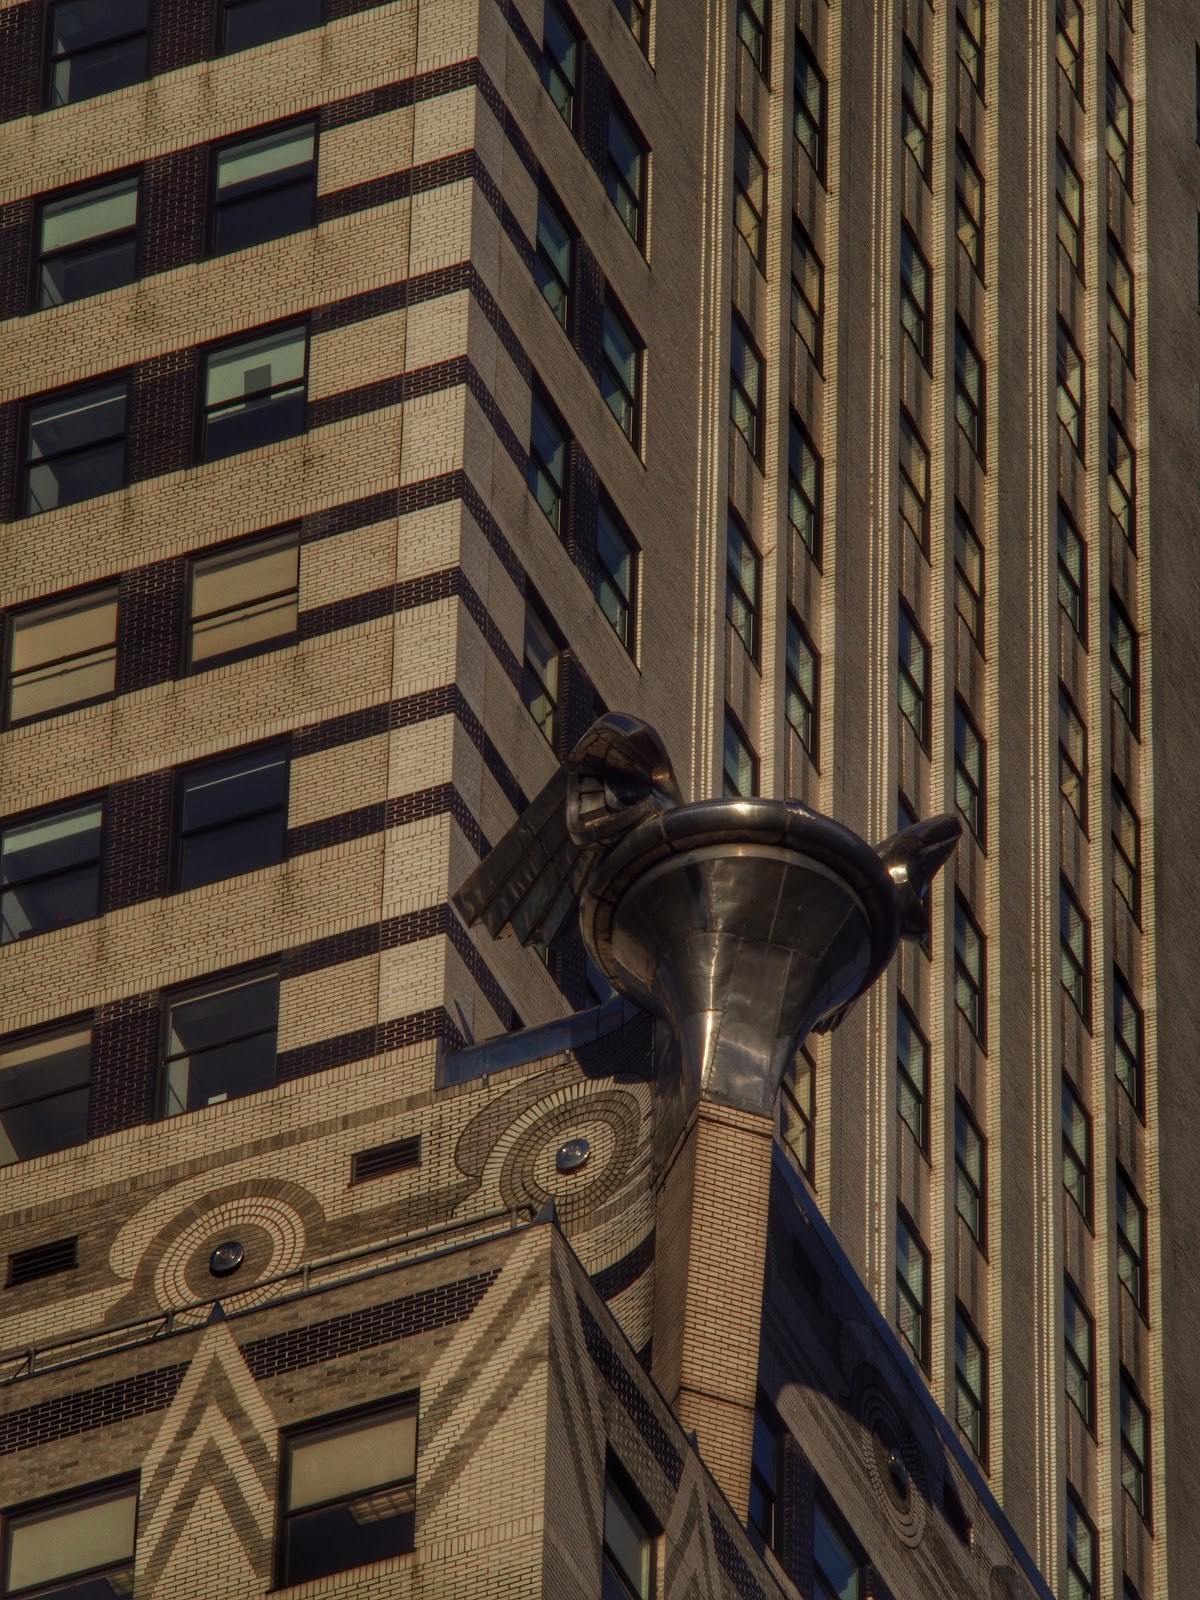 Decorative Elements on High, #ChryslerBuilding #AlwaysLookUp #artdeco #architecture #NYC 2014